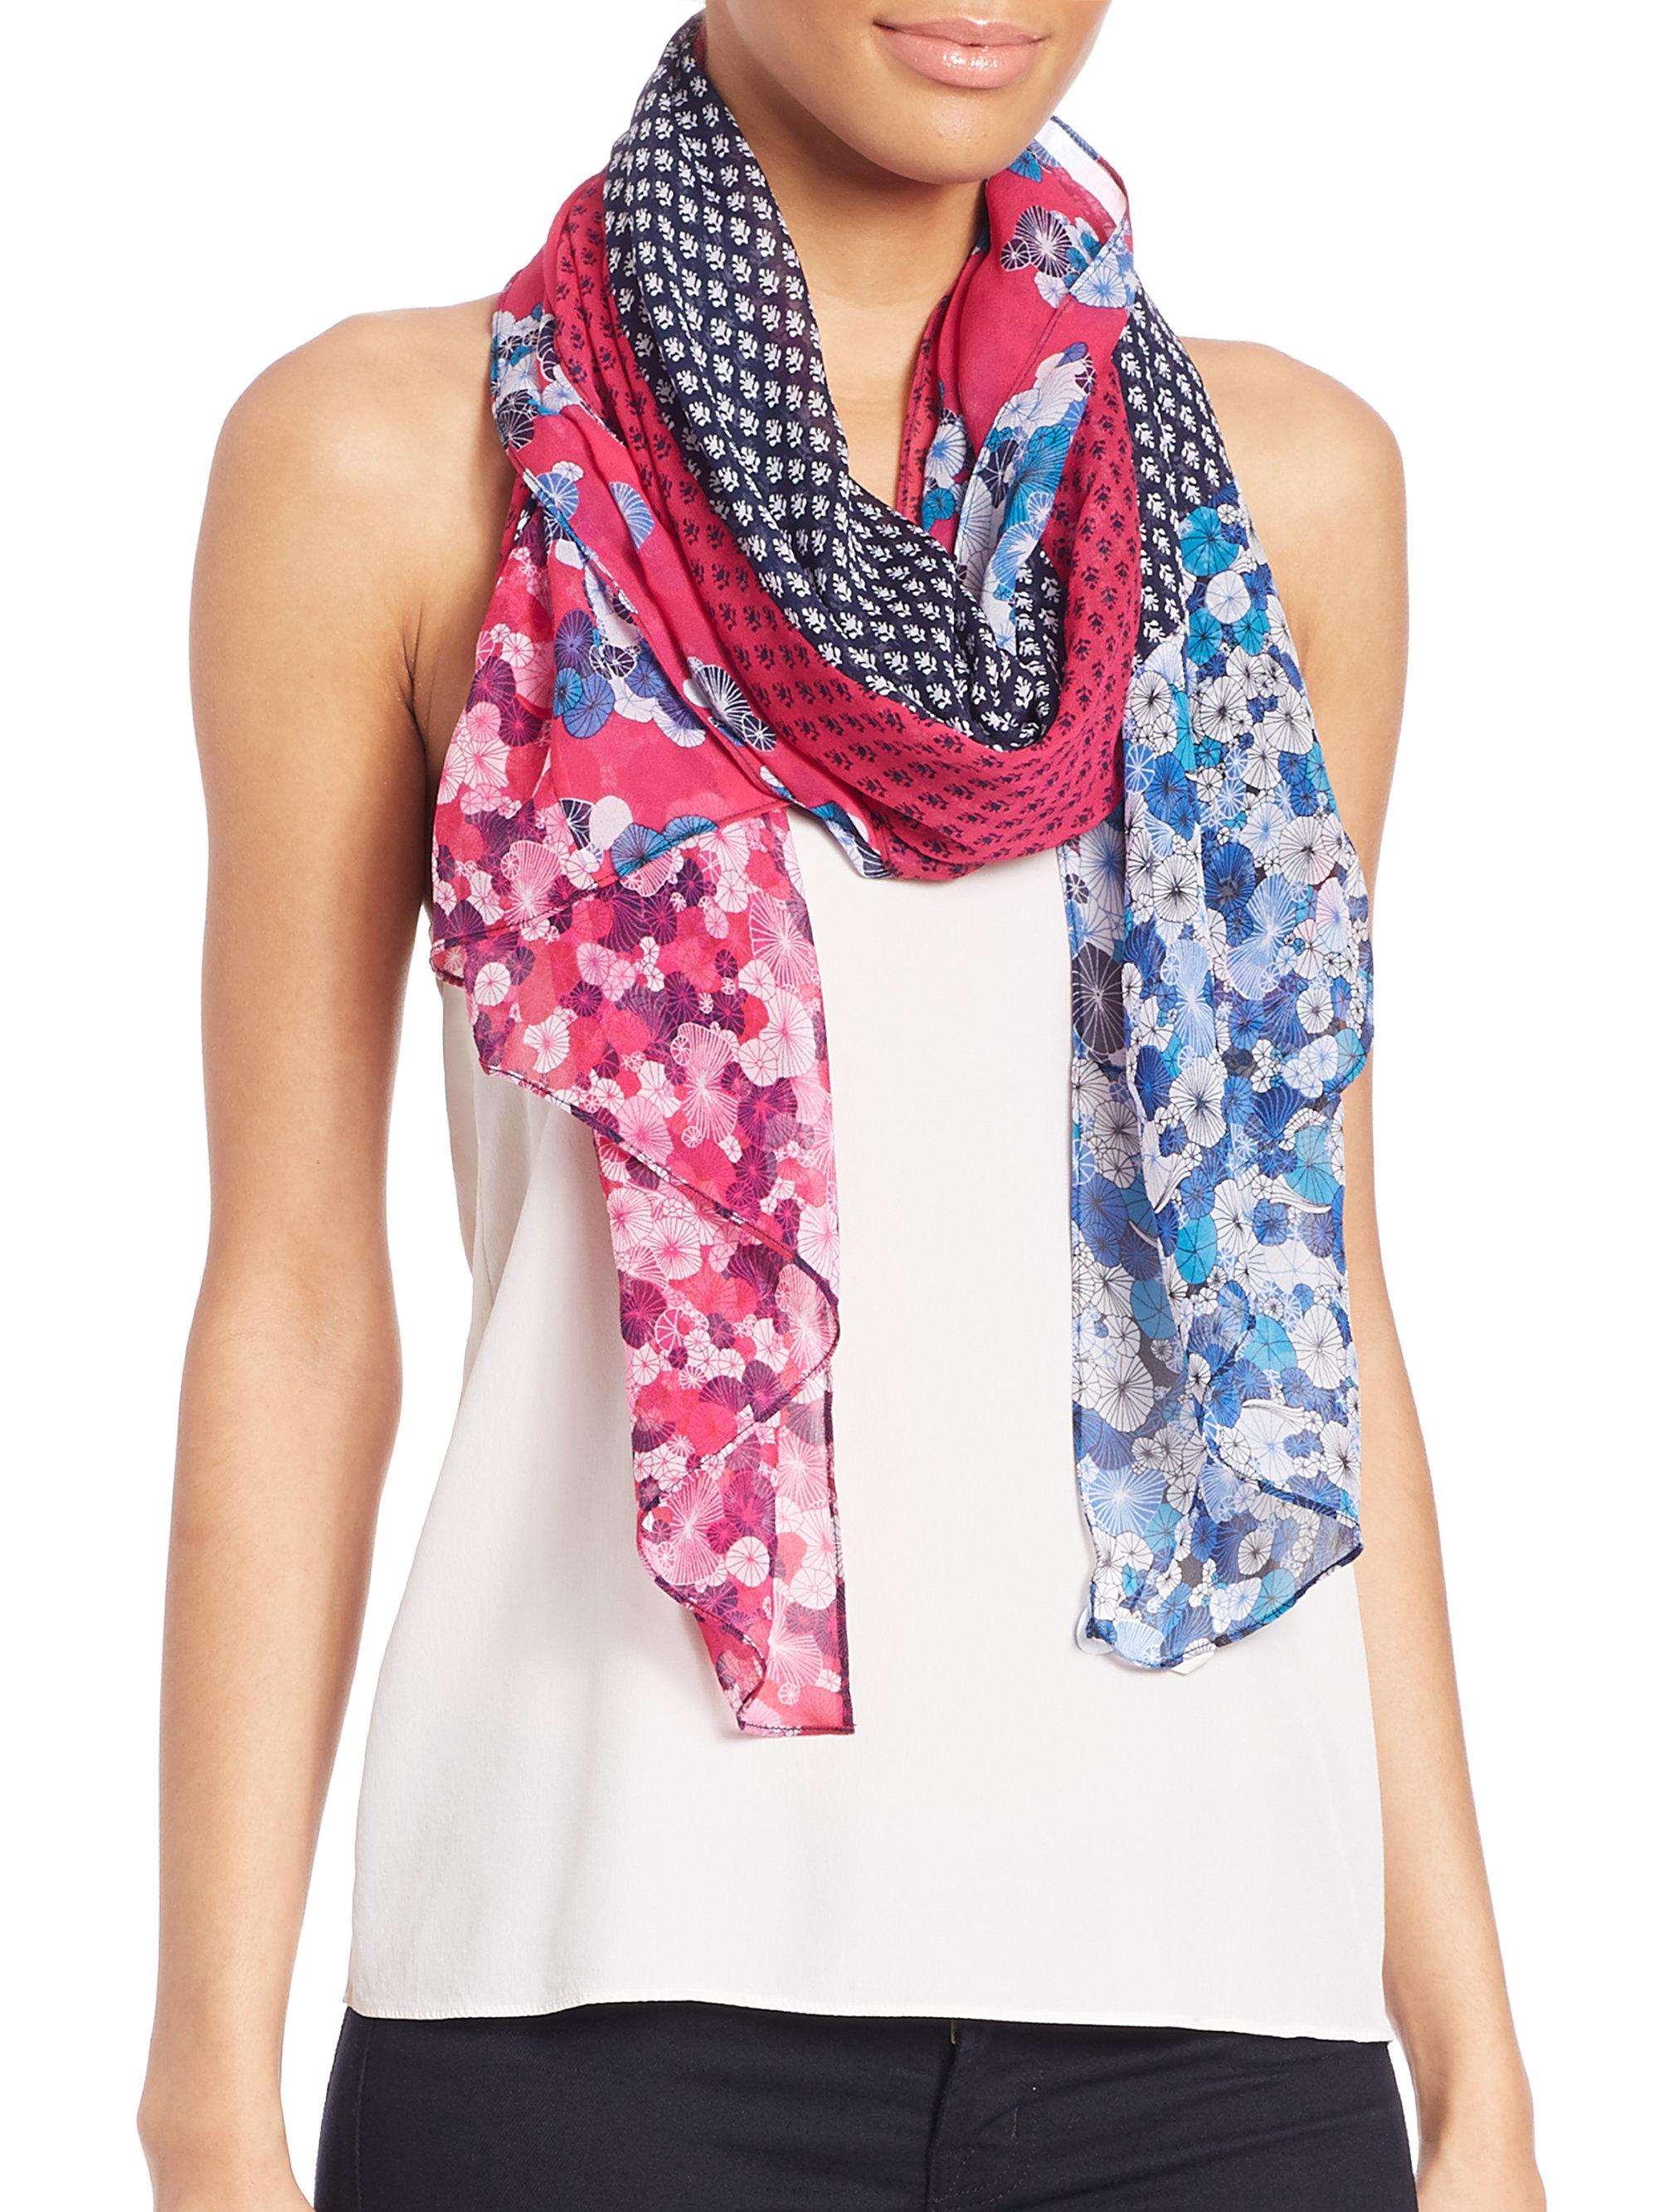 ditsy floral print scarf - Multicolour Diane Von F??rstenberg vxDPiDv